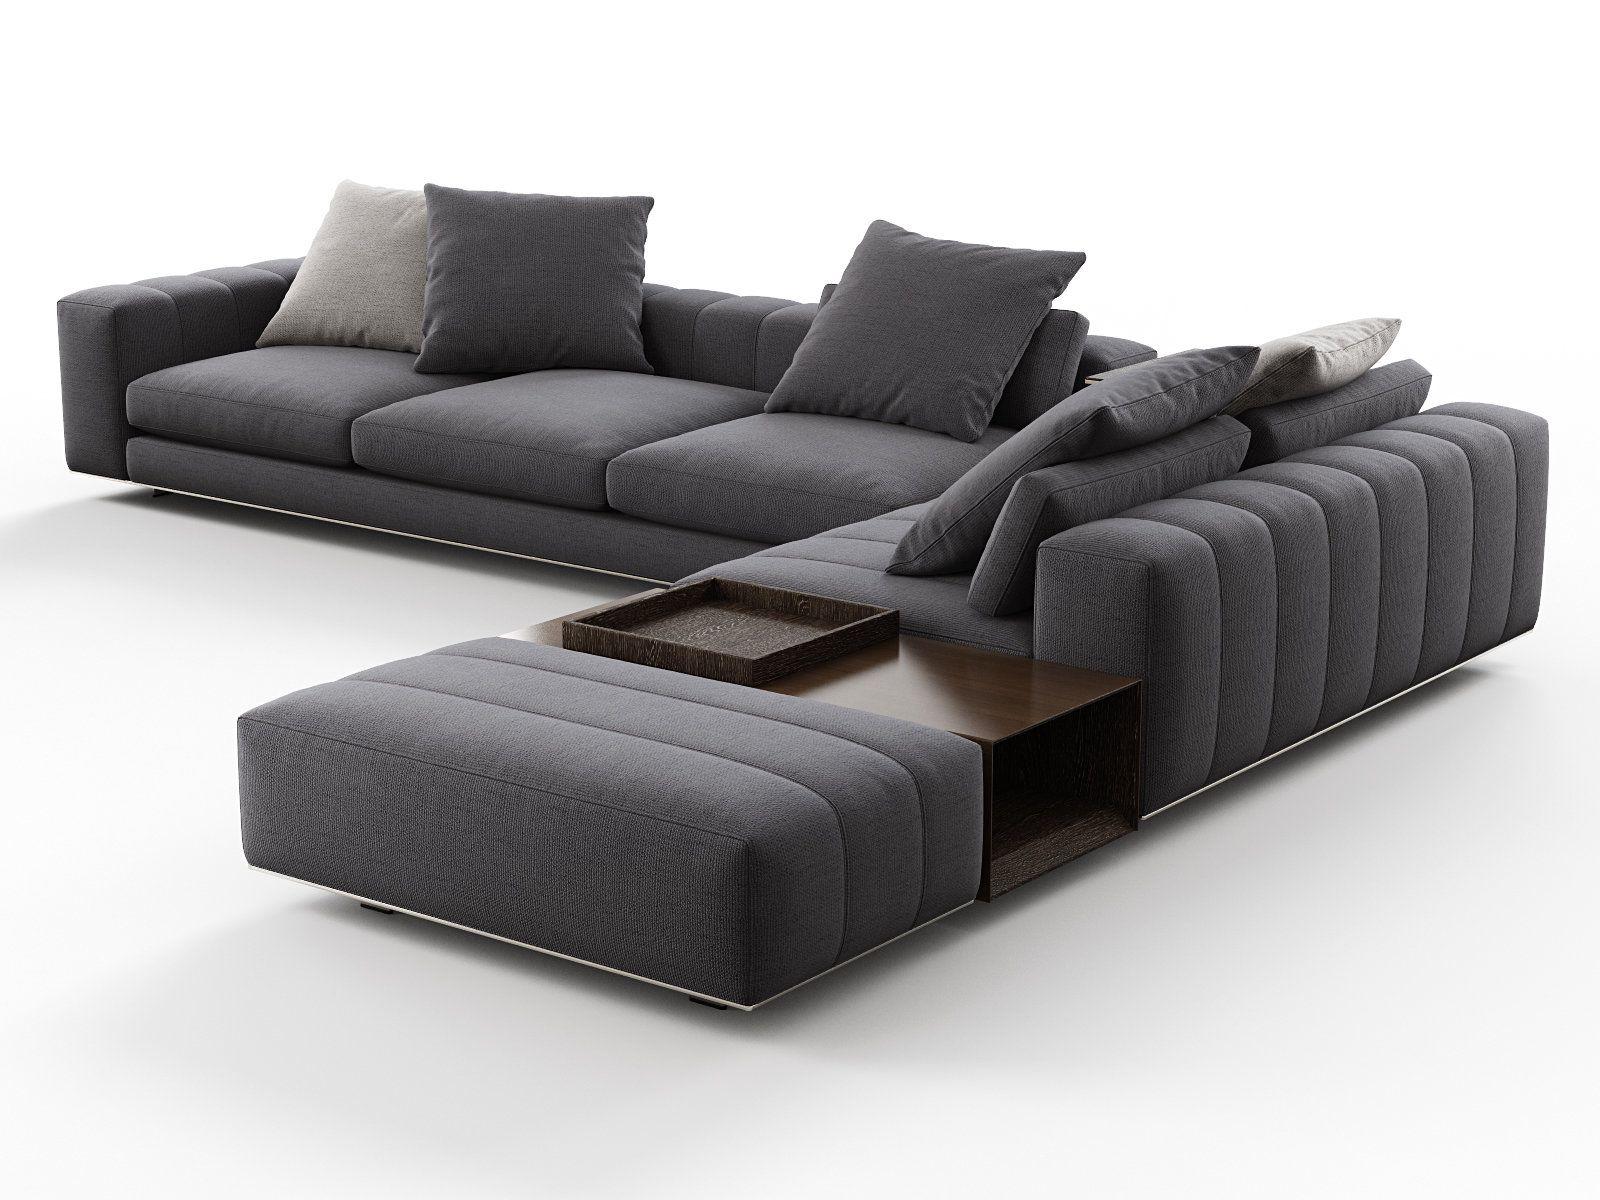 Freeman Corner Sofa System N 3d Model By Design Connected Corner Sofa Design Living Room Sofa Set Modern Sofa Designs